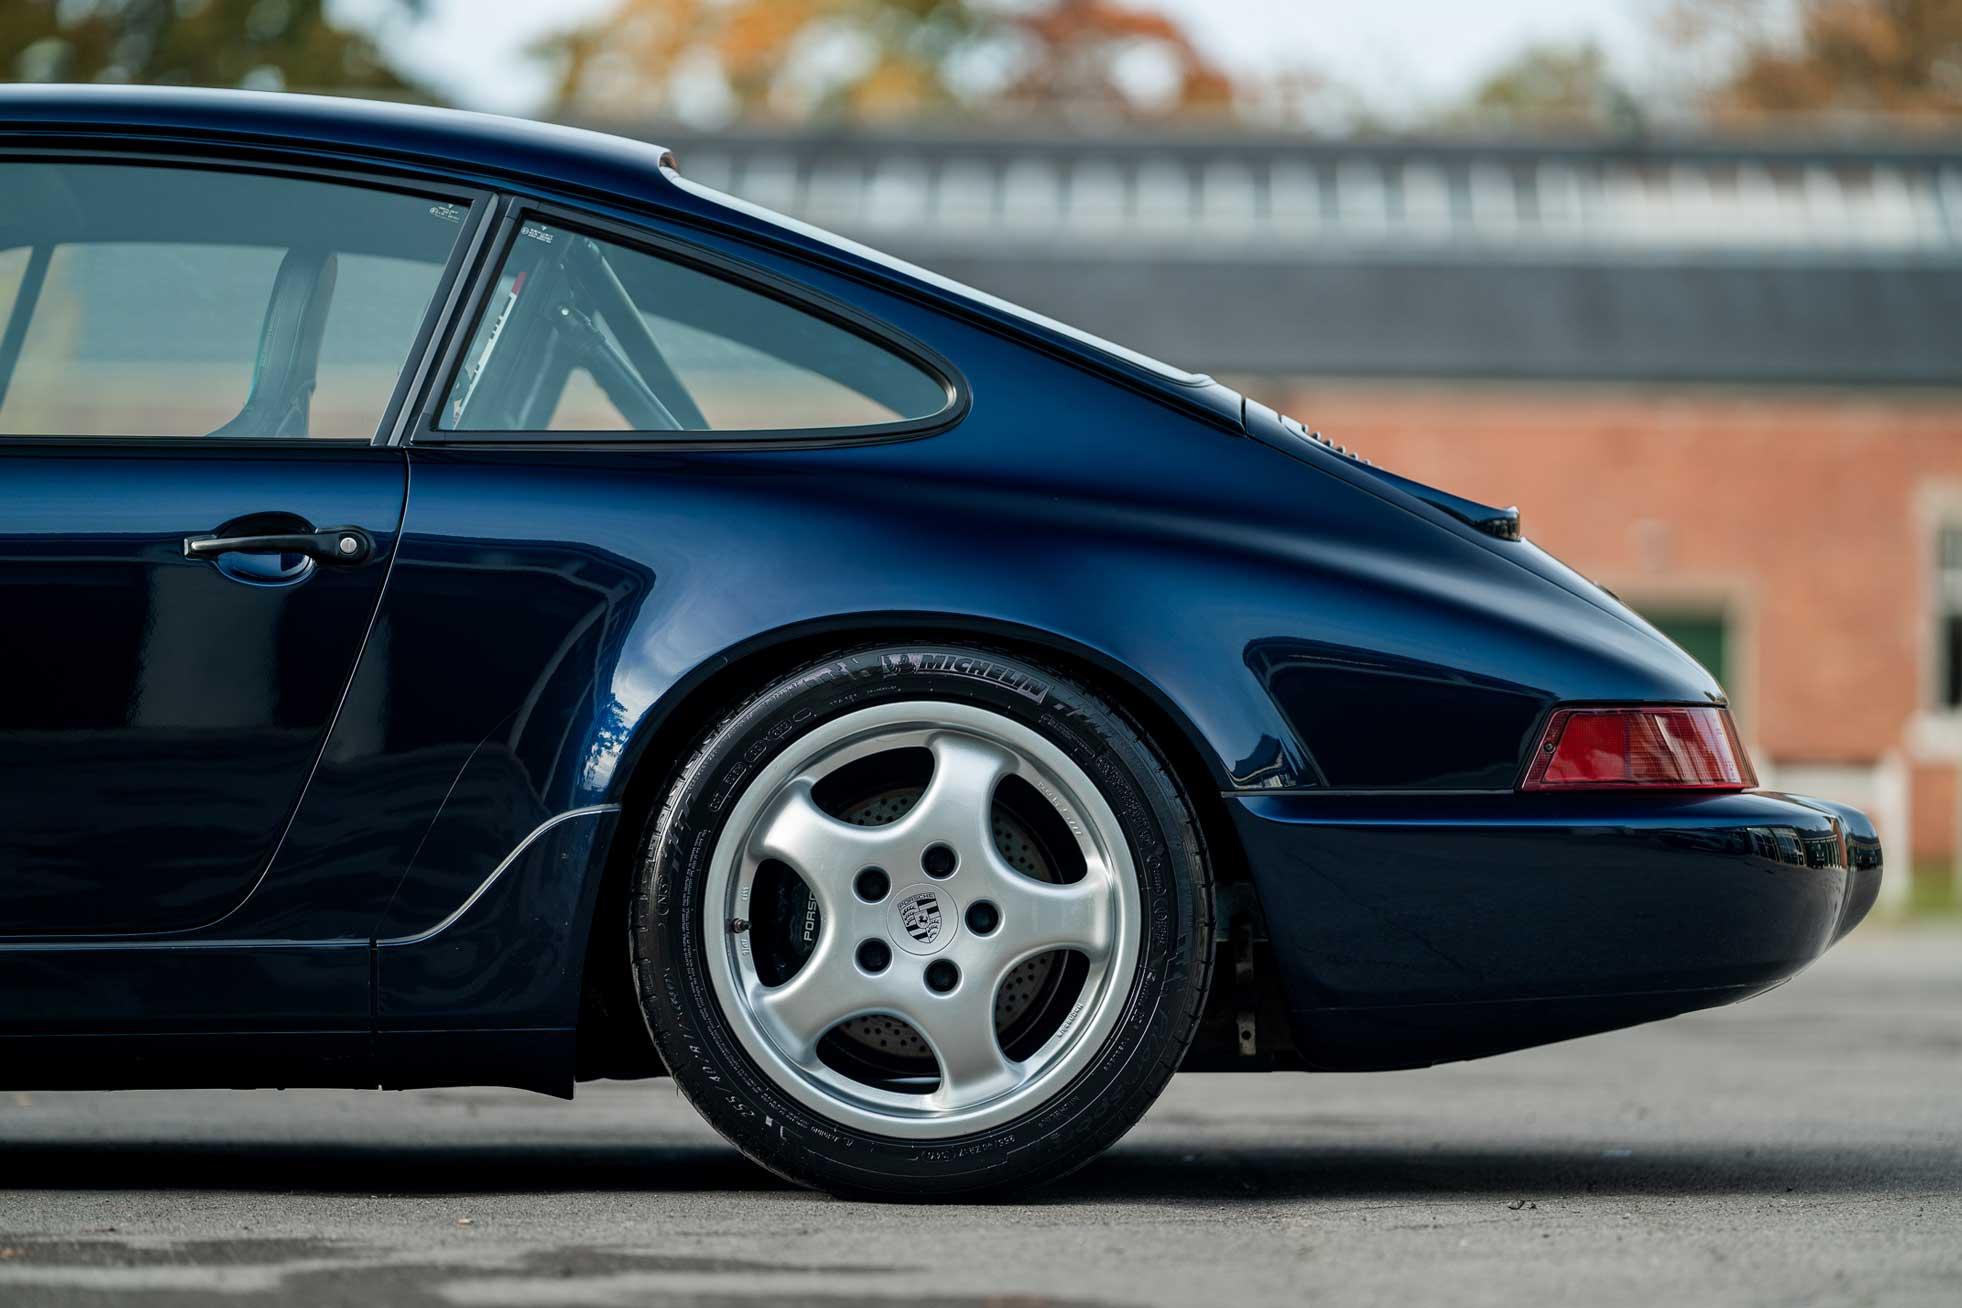 For sale 1991 Porsche Carrera 964 RS. Sports